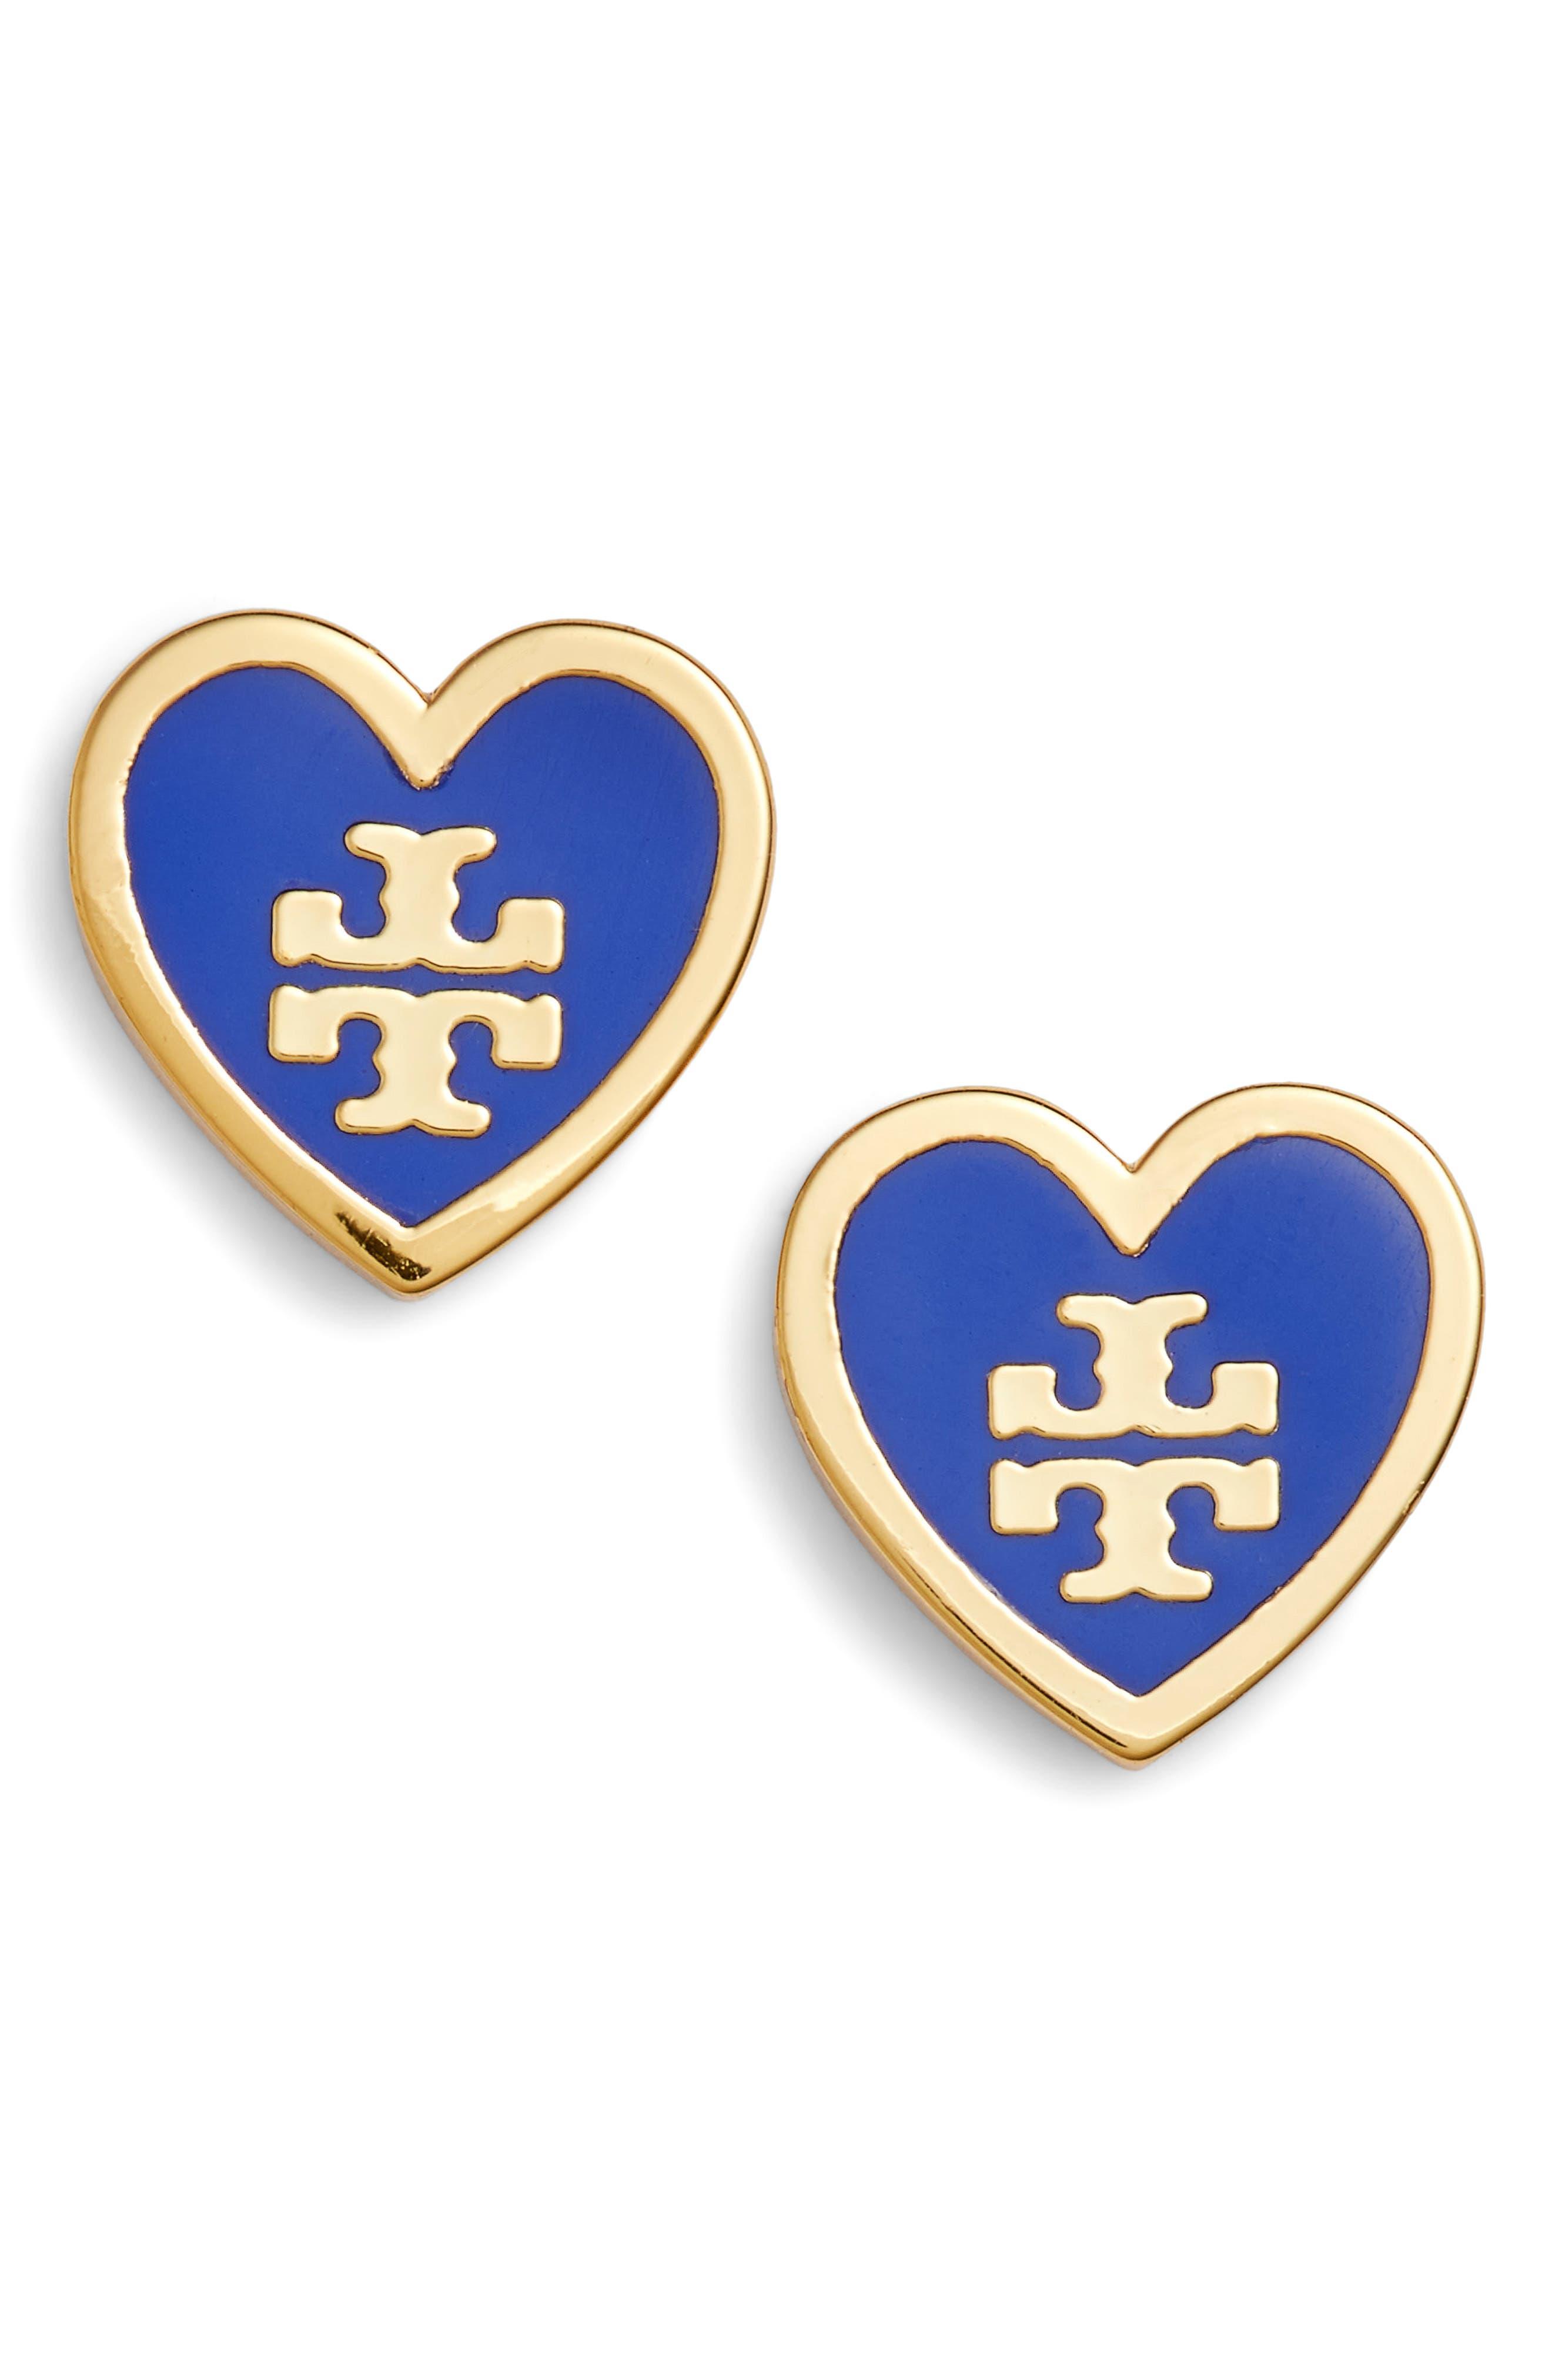 Main Image - Tory Burch Logo Heart Stud Earrings